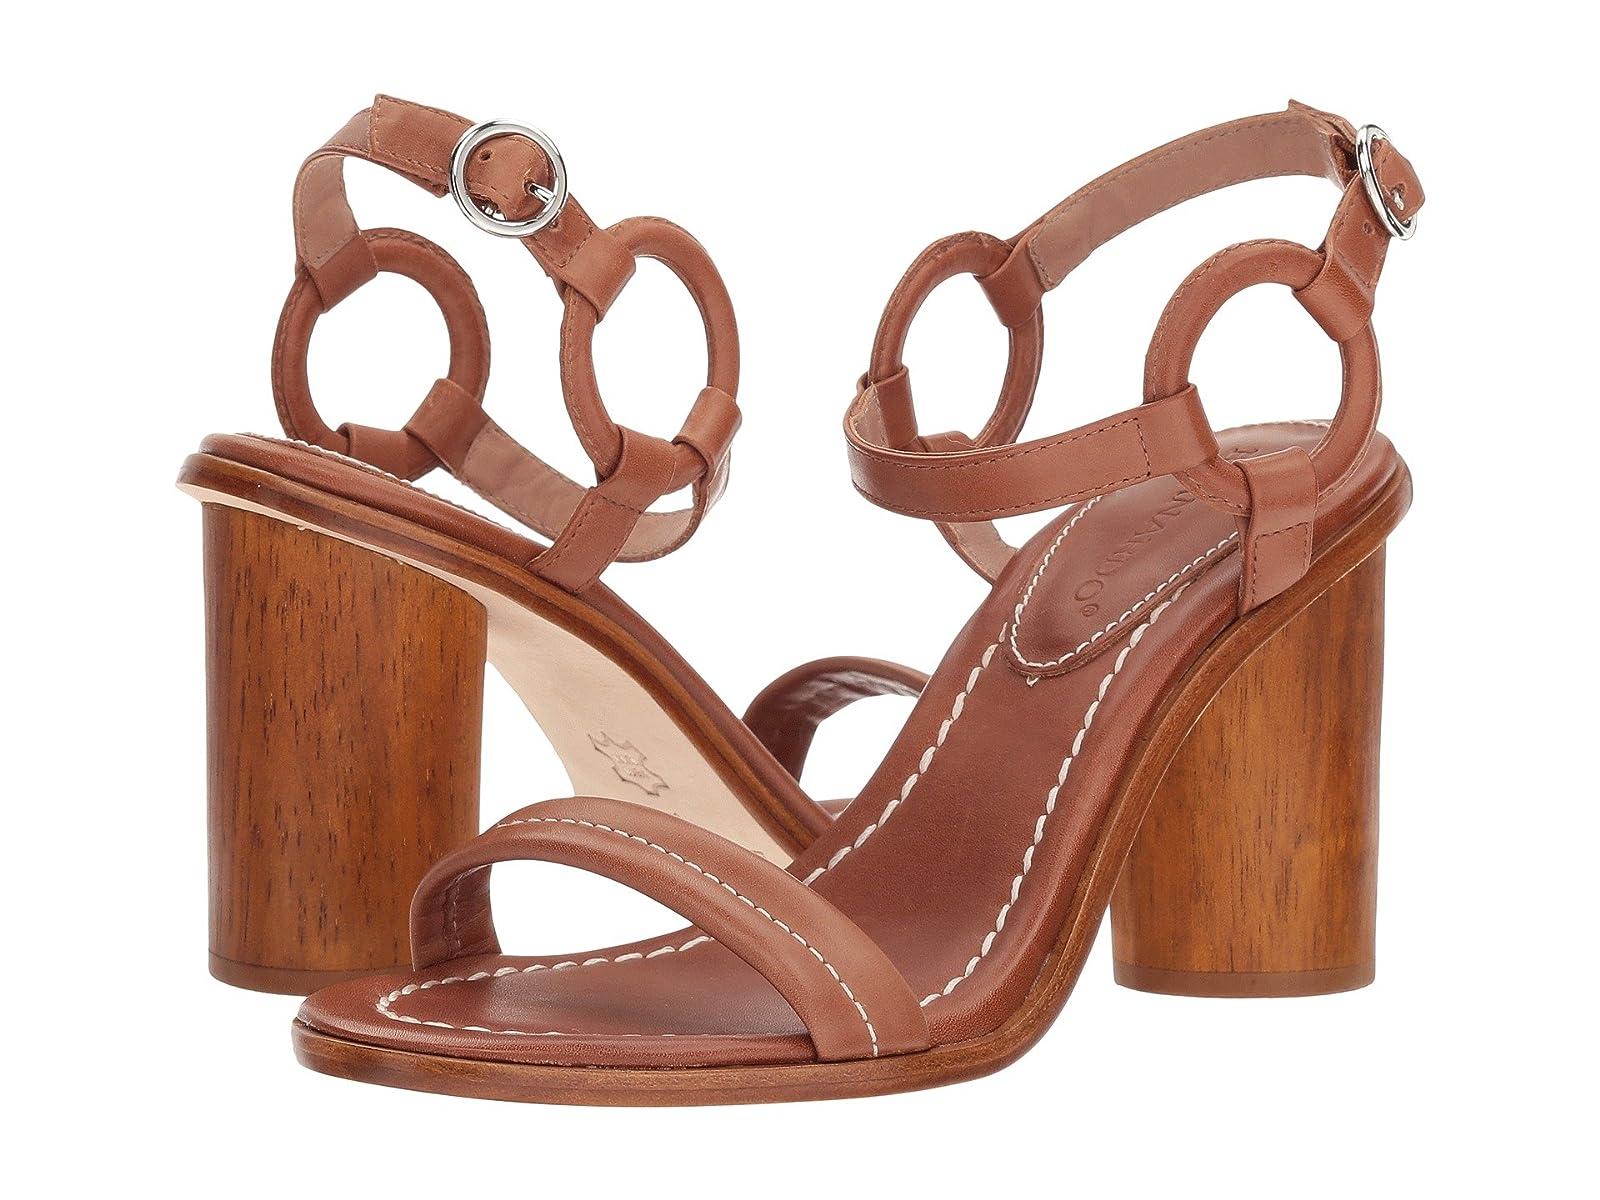 Bernardo HarlowCheap and distinctive eye-catching shoes